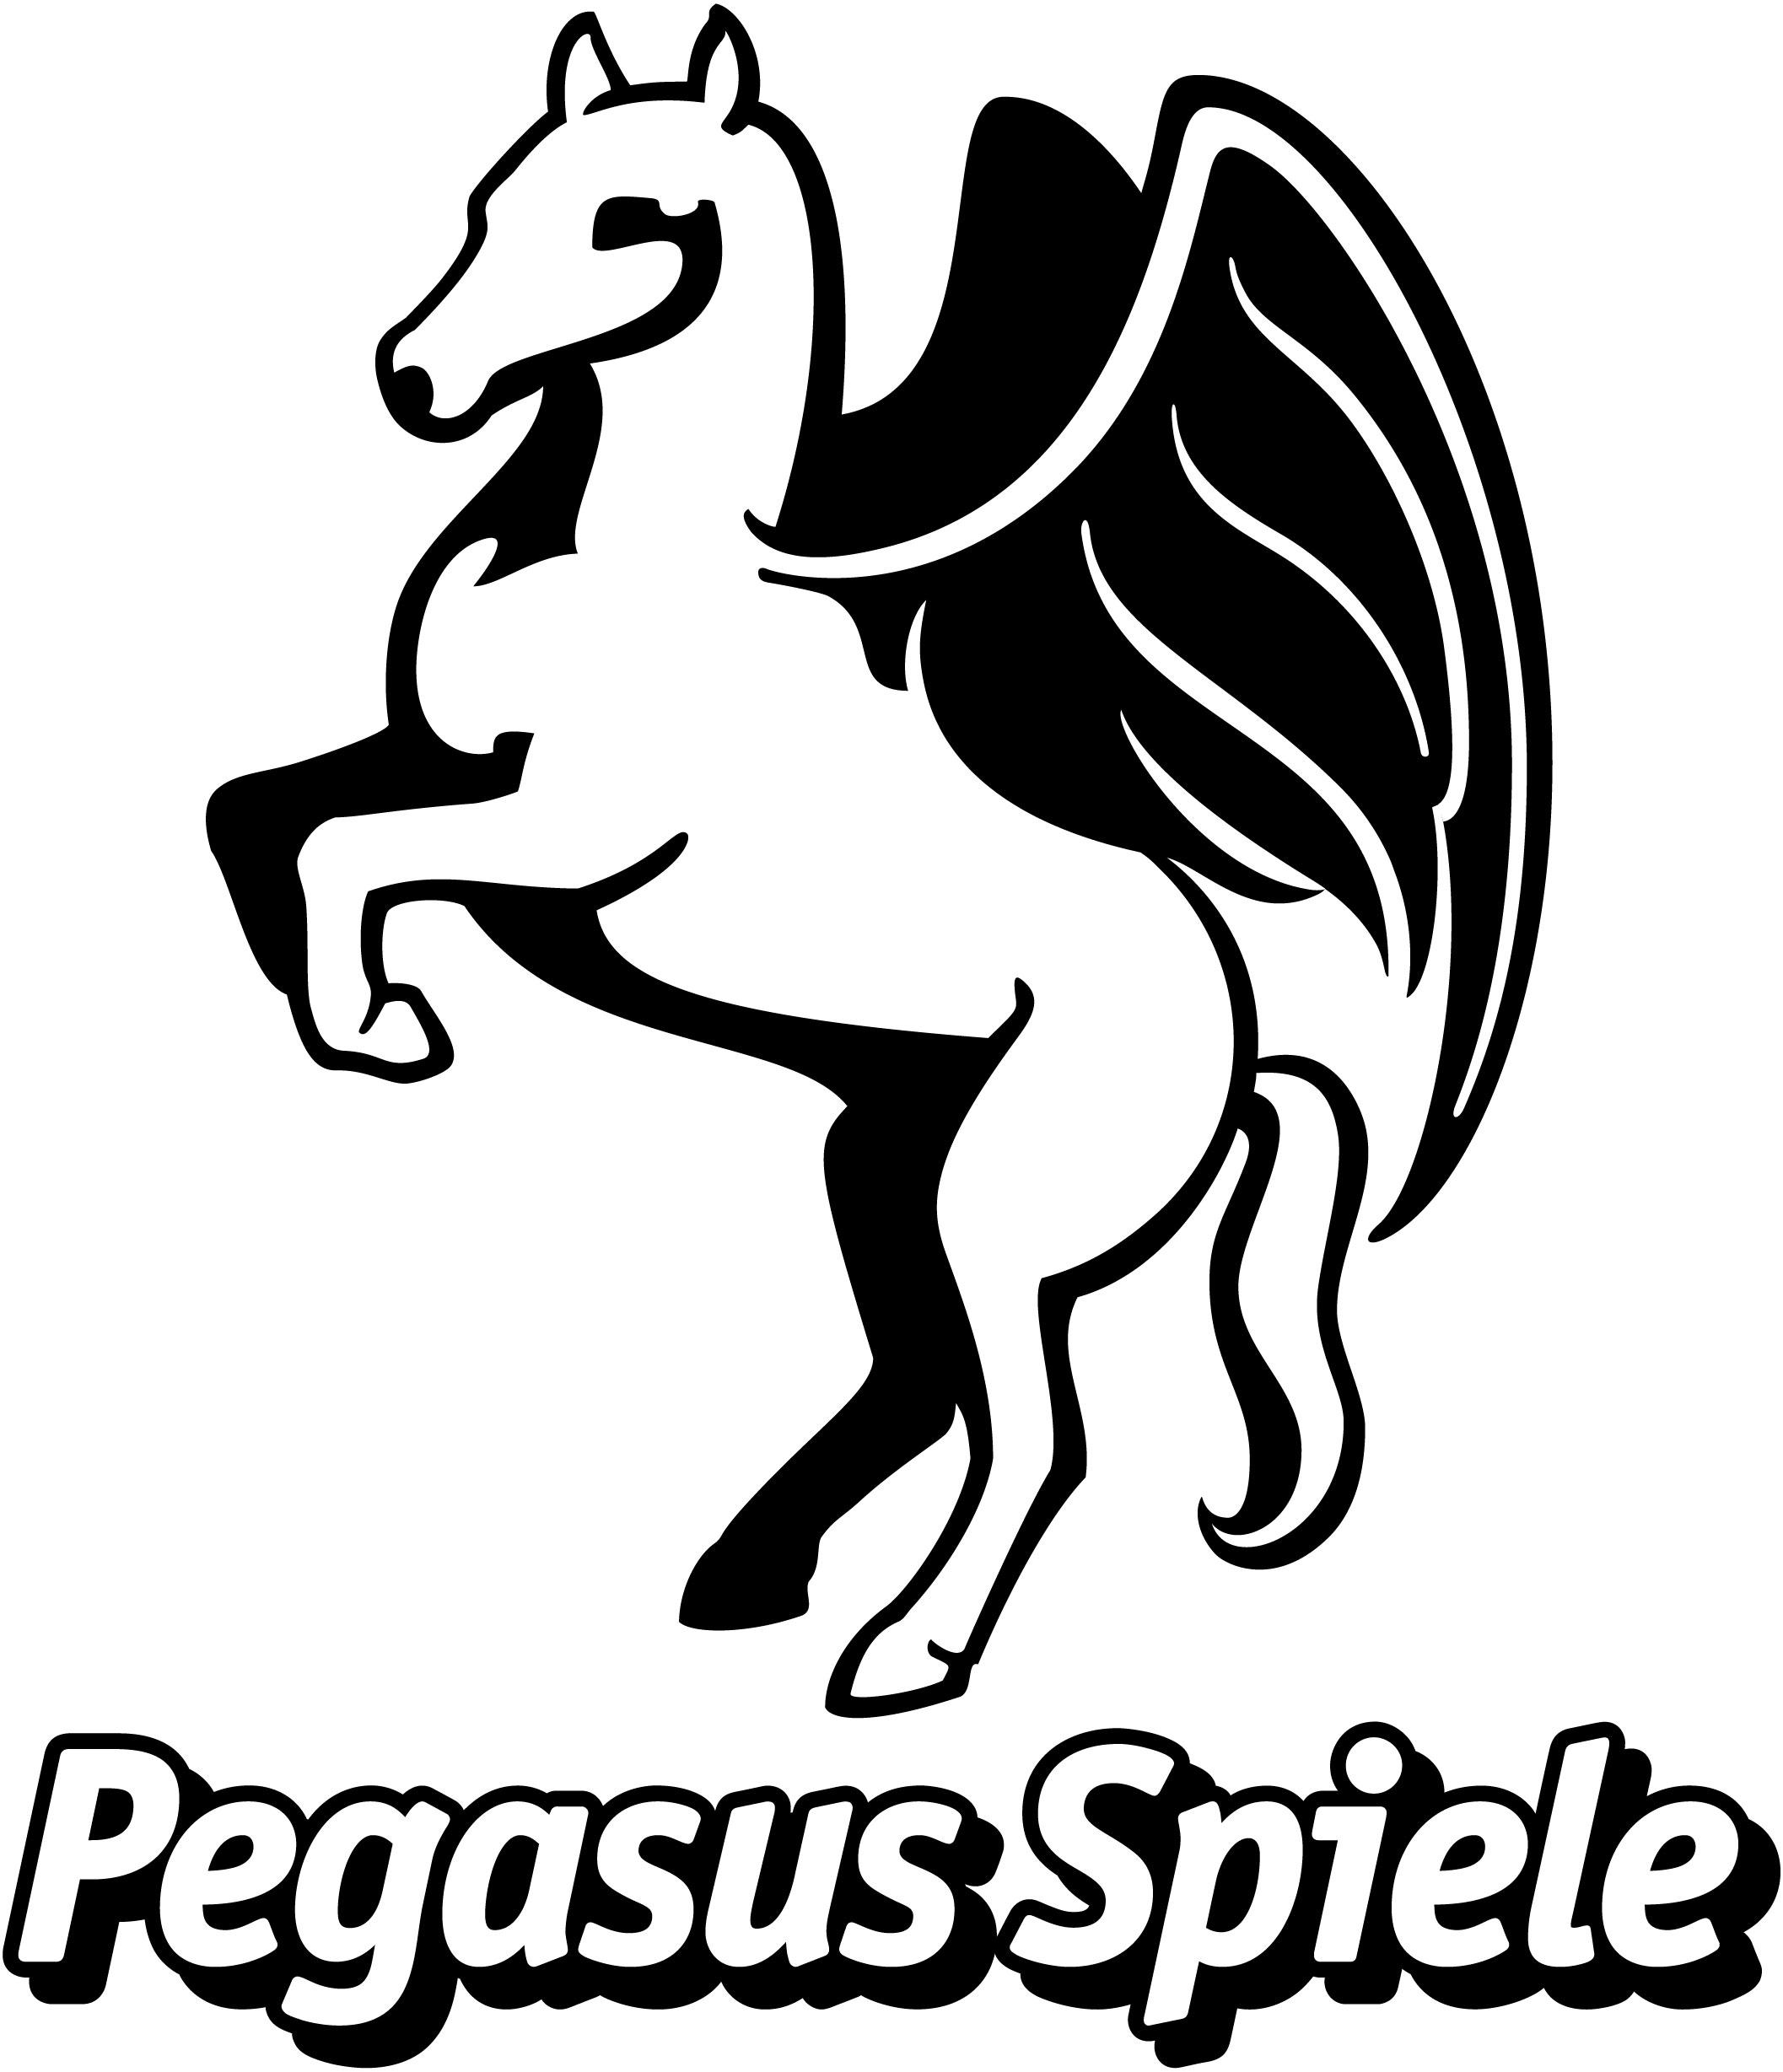 Pegasus Spiele GrГјndung